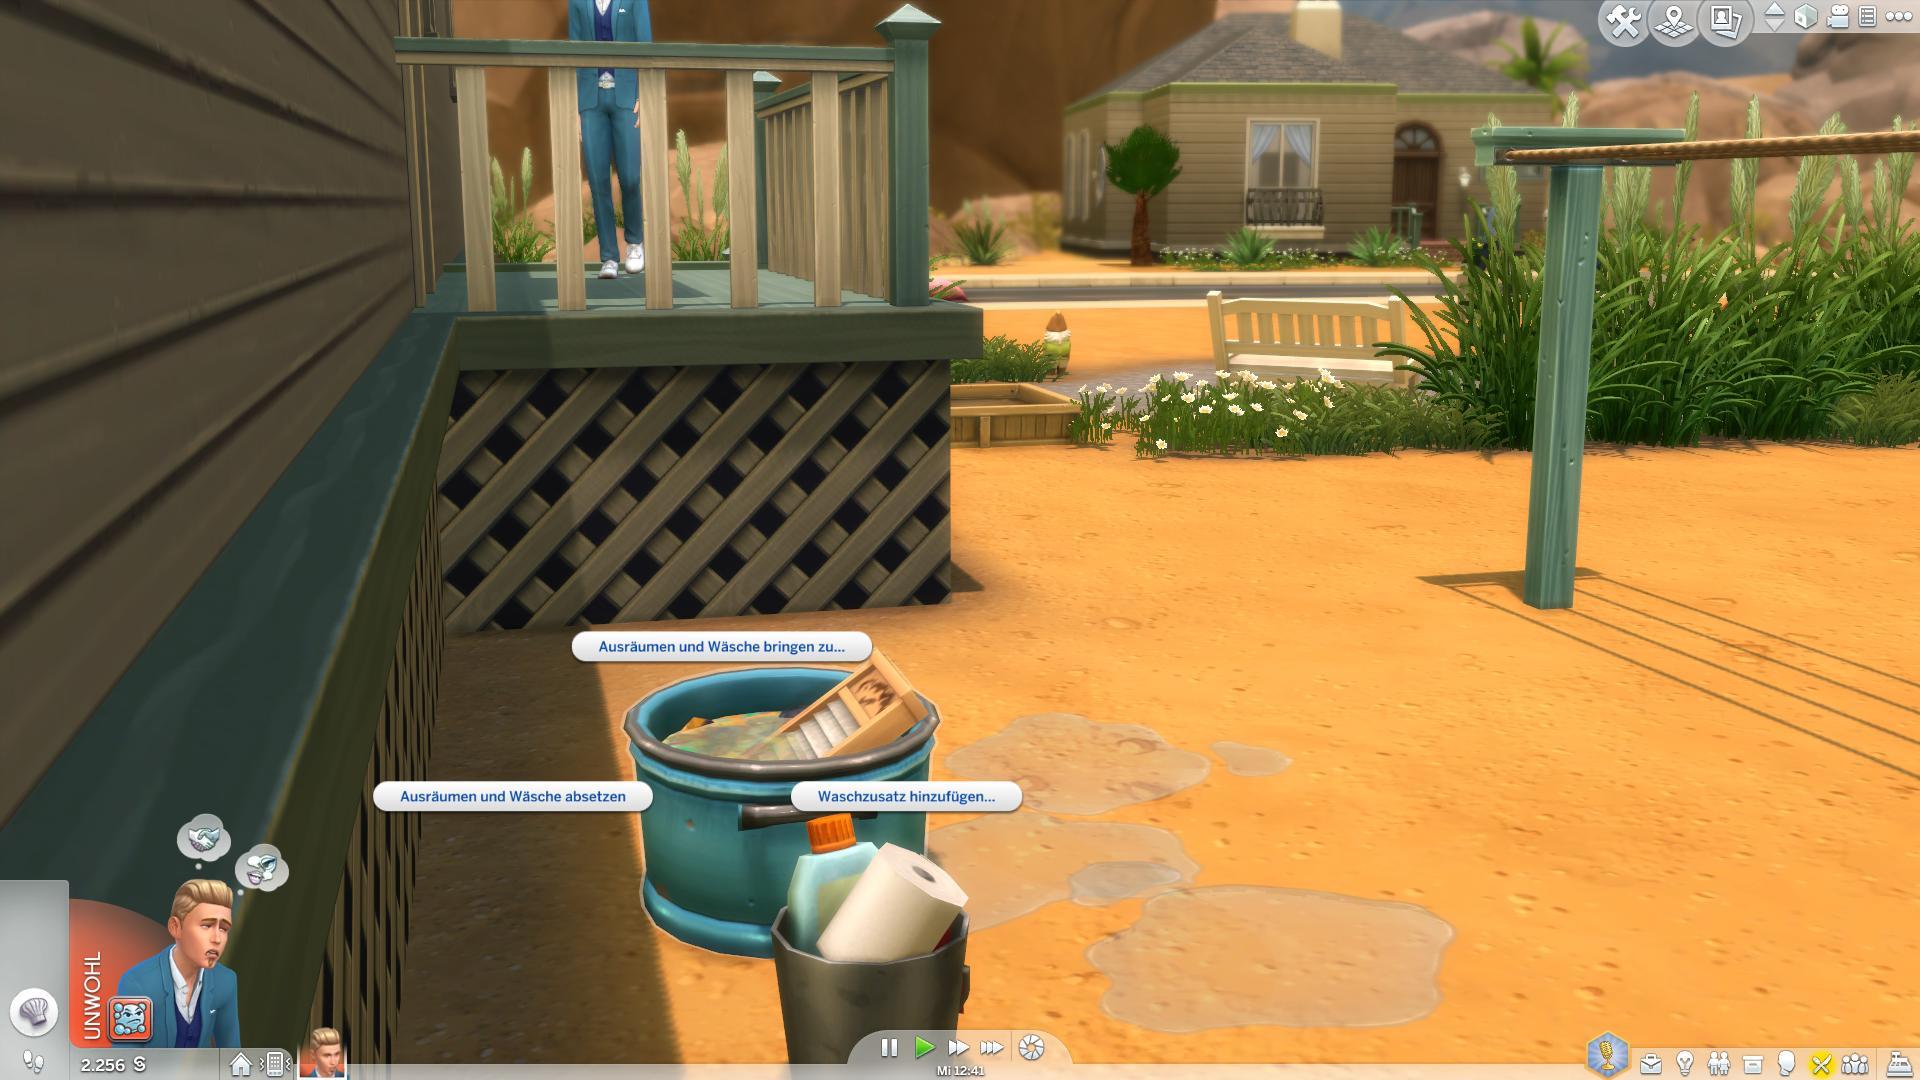 Die Sims 4: Screenshots zum Waschtag Accessoires